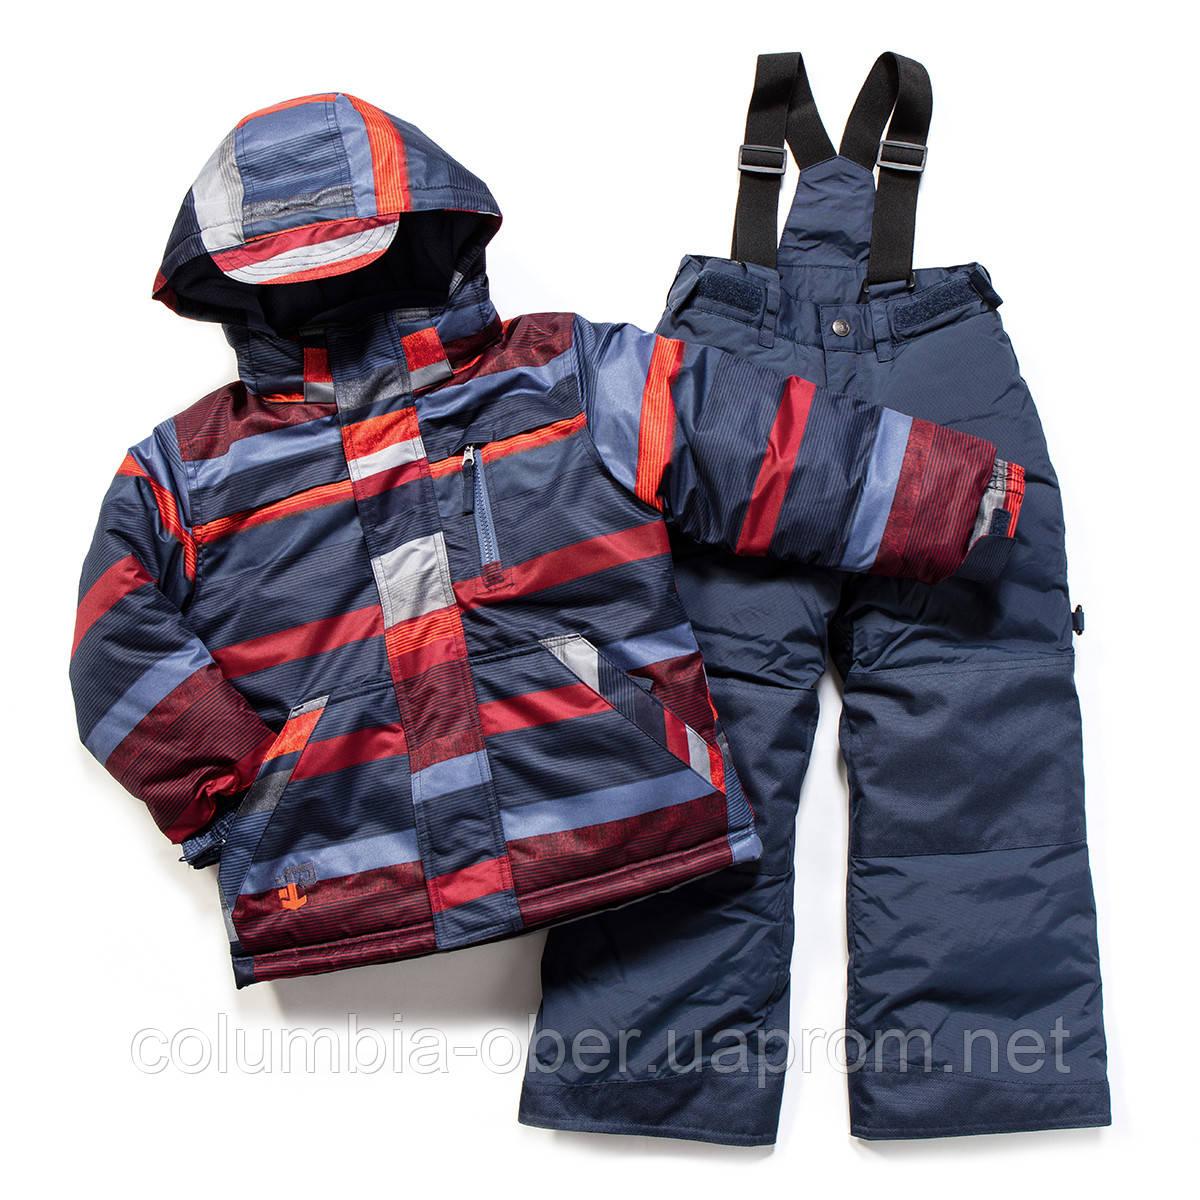 Зимний костюм для мальчика PELUCHE F17 M 53 EG Spicy Red Pepper / Dk Heaven. Размеры 4 - 8.